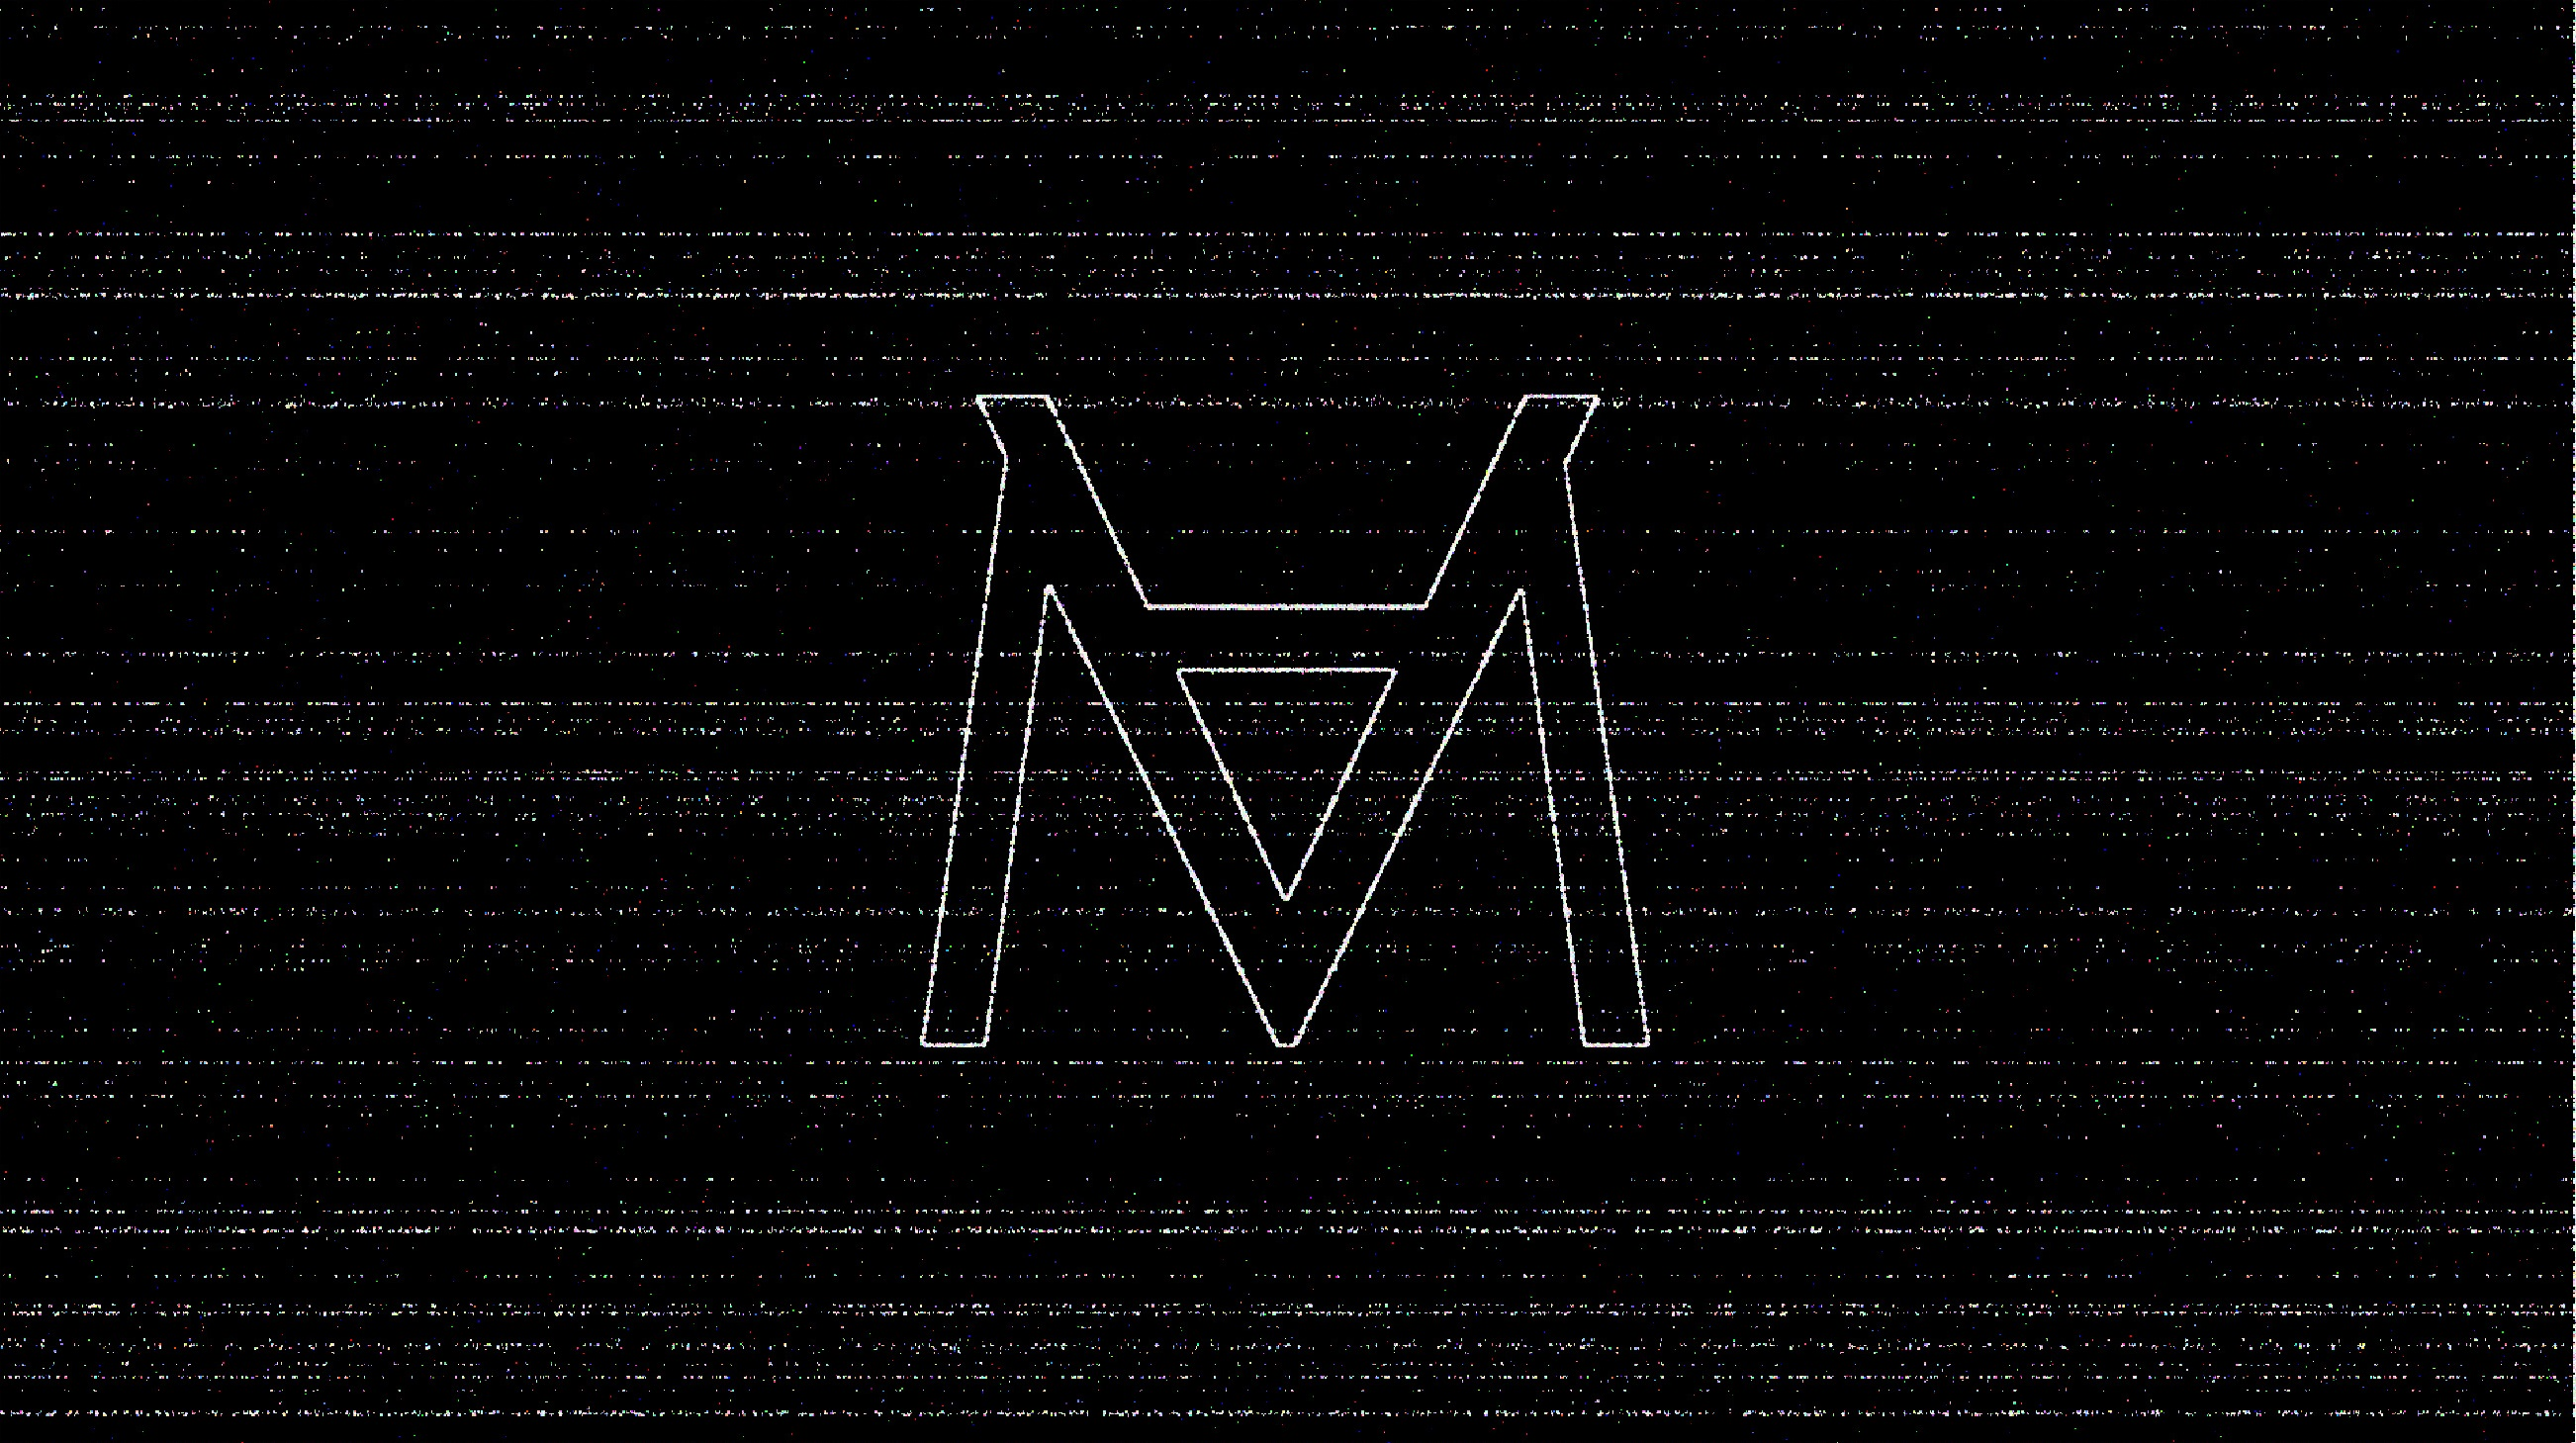 Mida_logo_glitch_wallpaper2